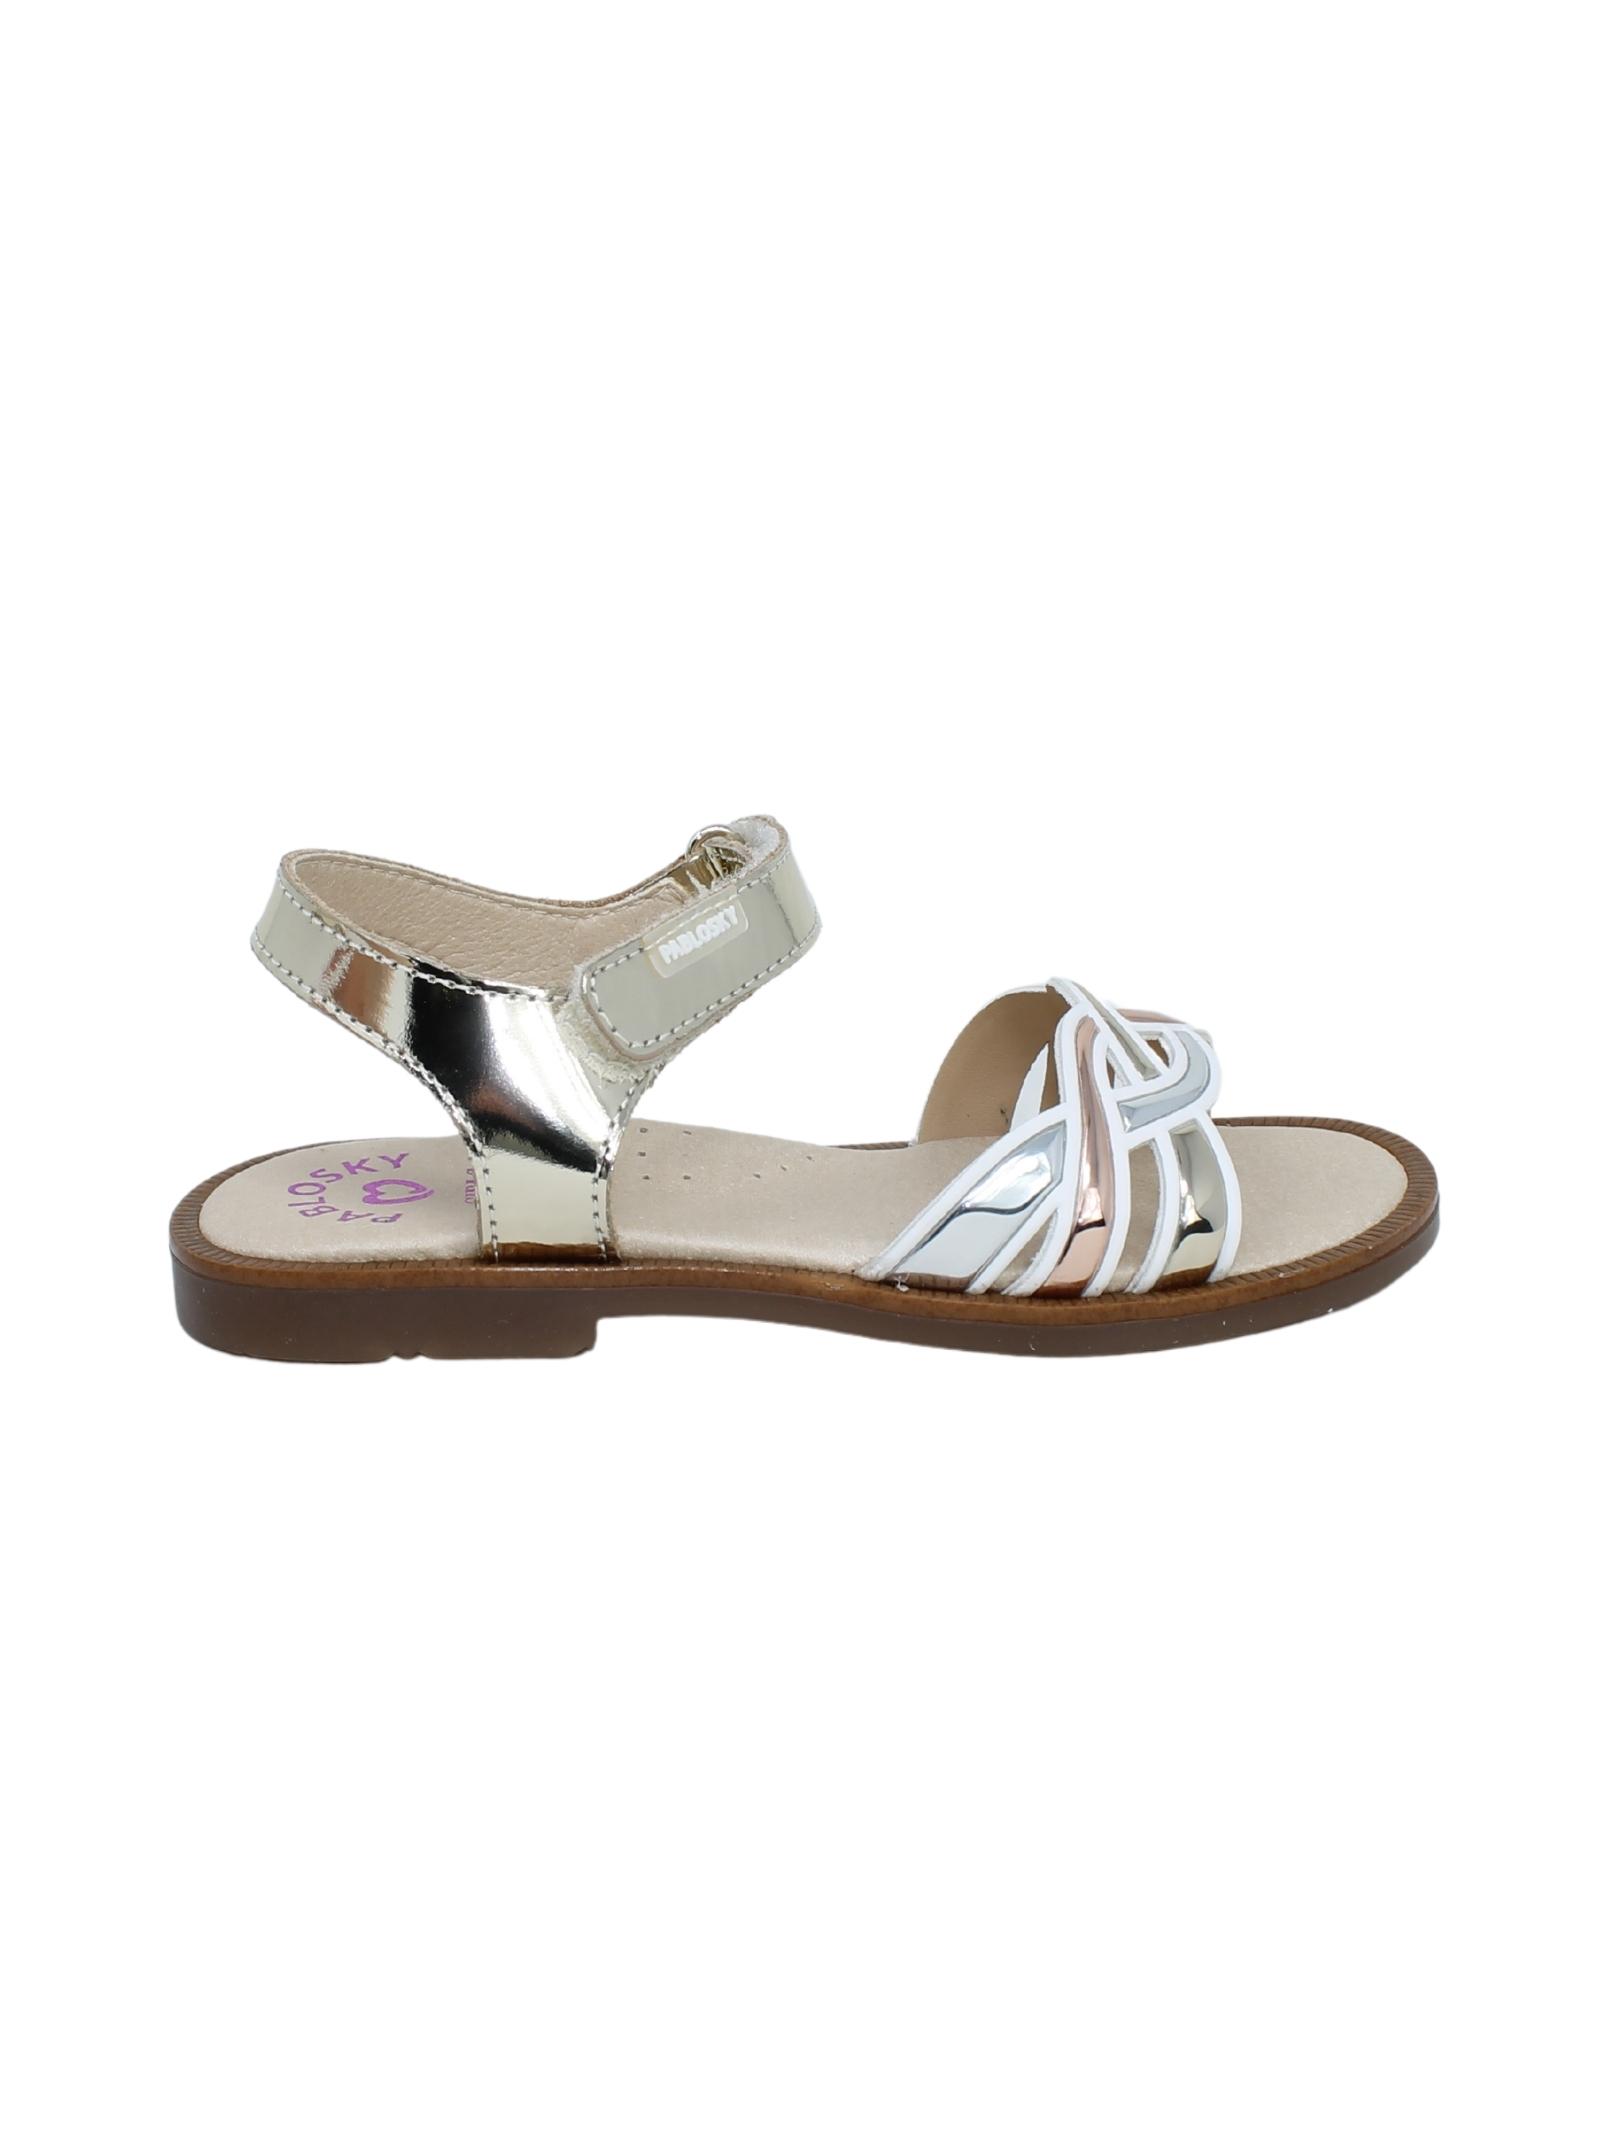 Sandalo Bambina Mirror Champagne PABLOSKY | Sandali | 496581ORO